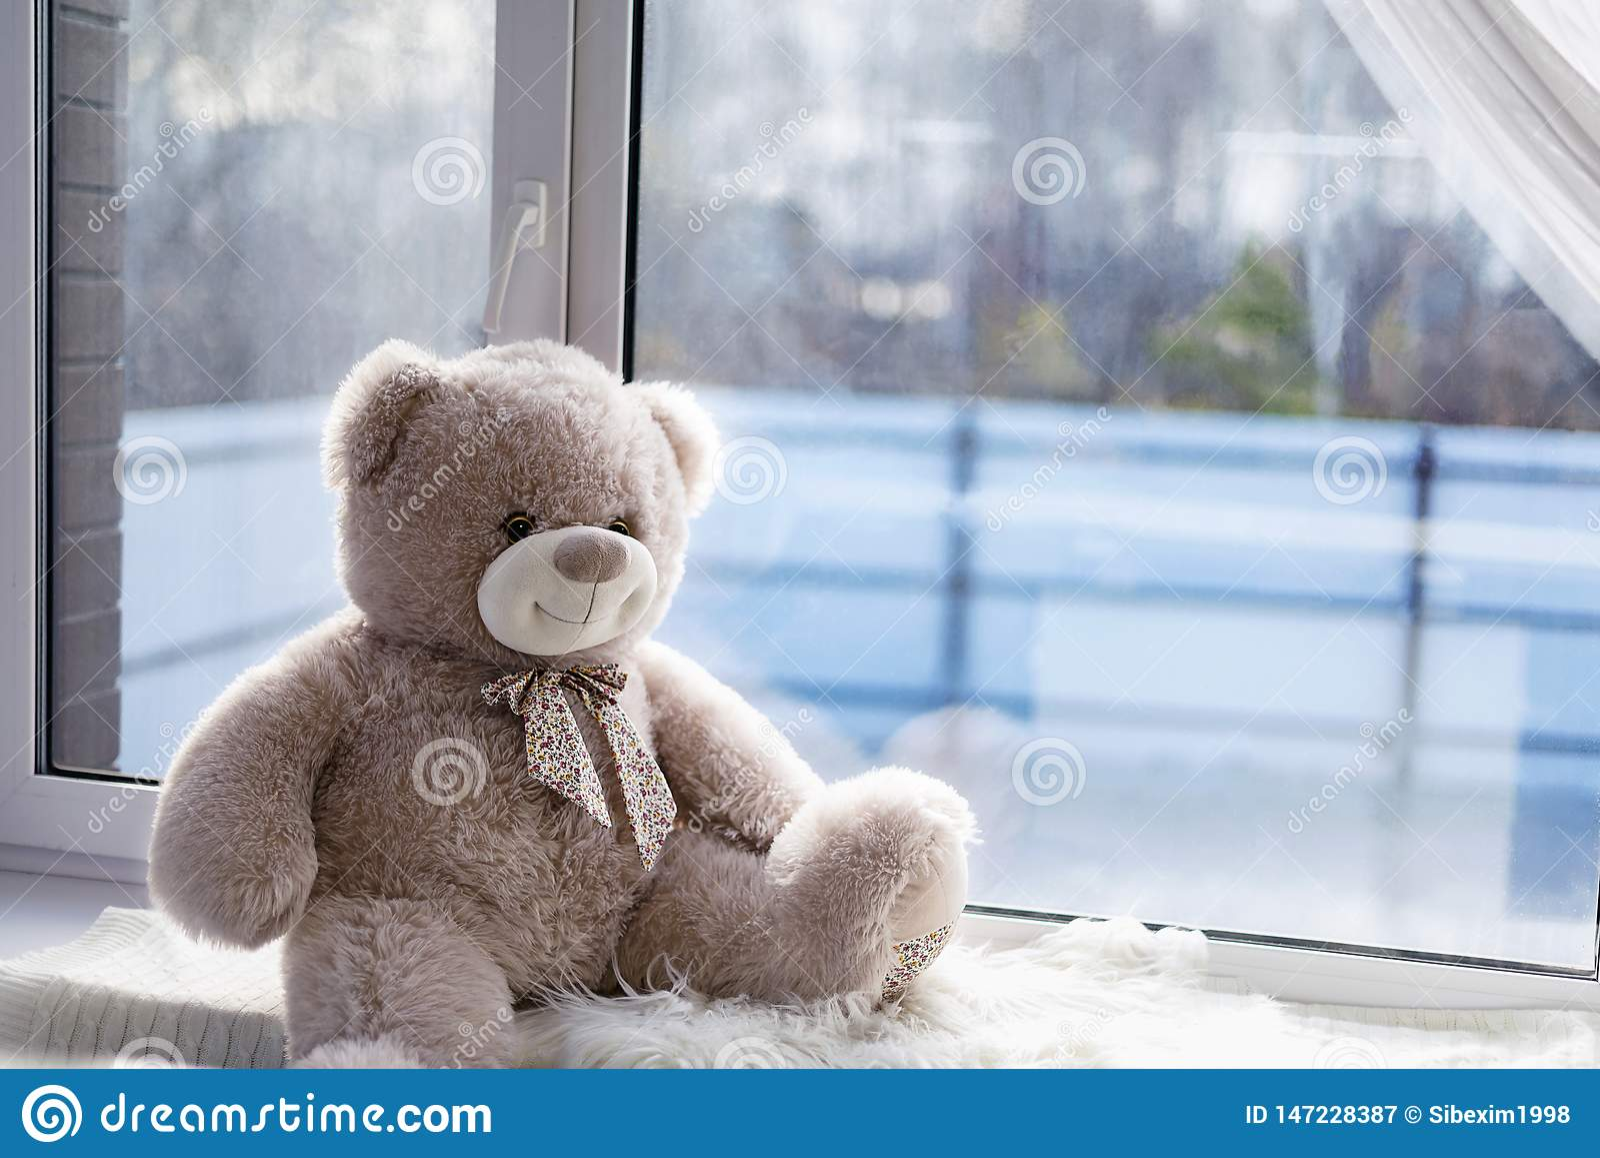 Toy bear sits on a window